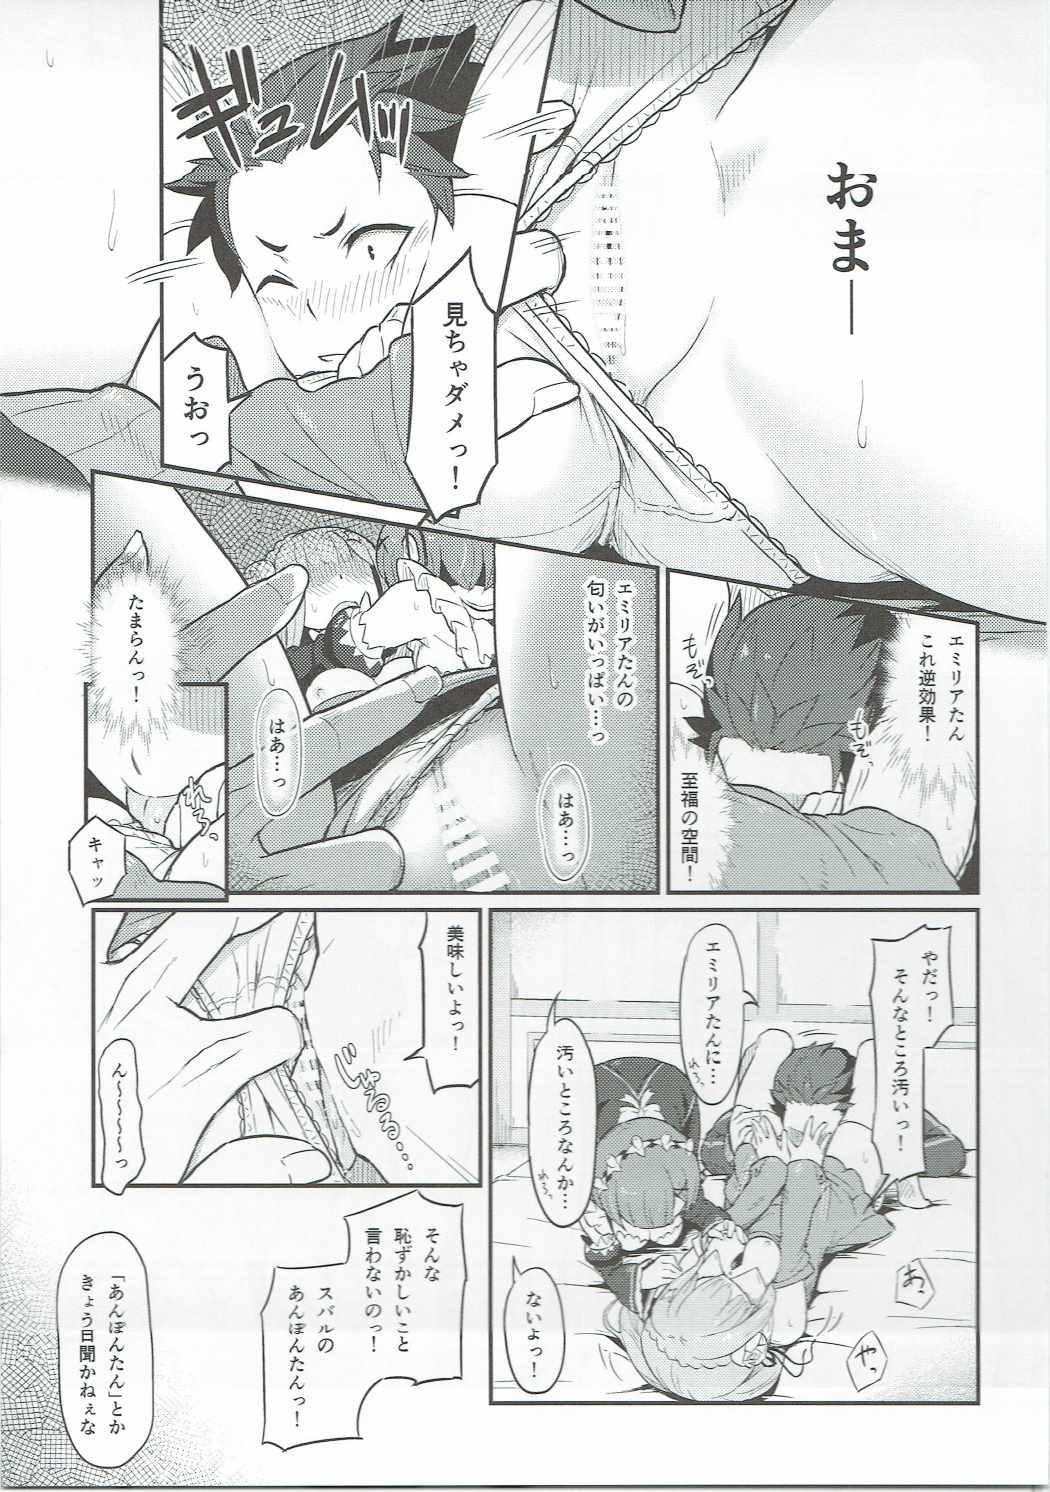 Rem no Emilia Kuttsuke Daisakusen 13